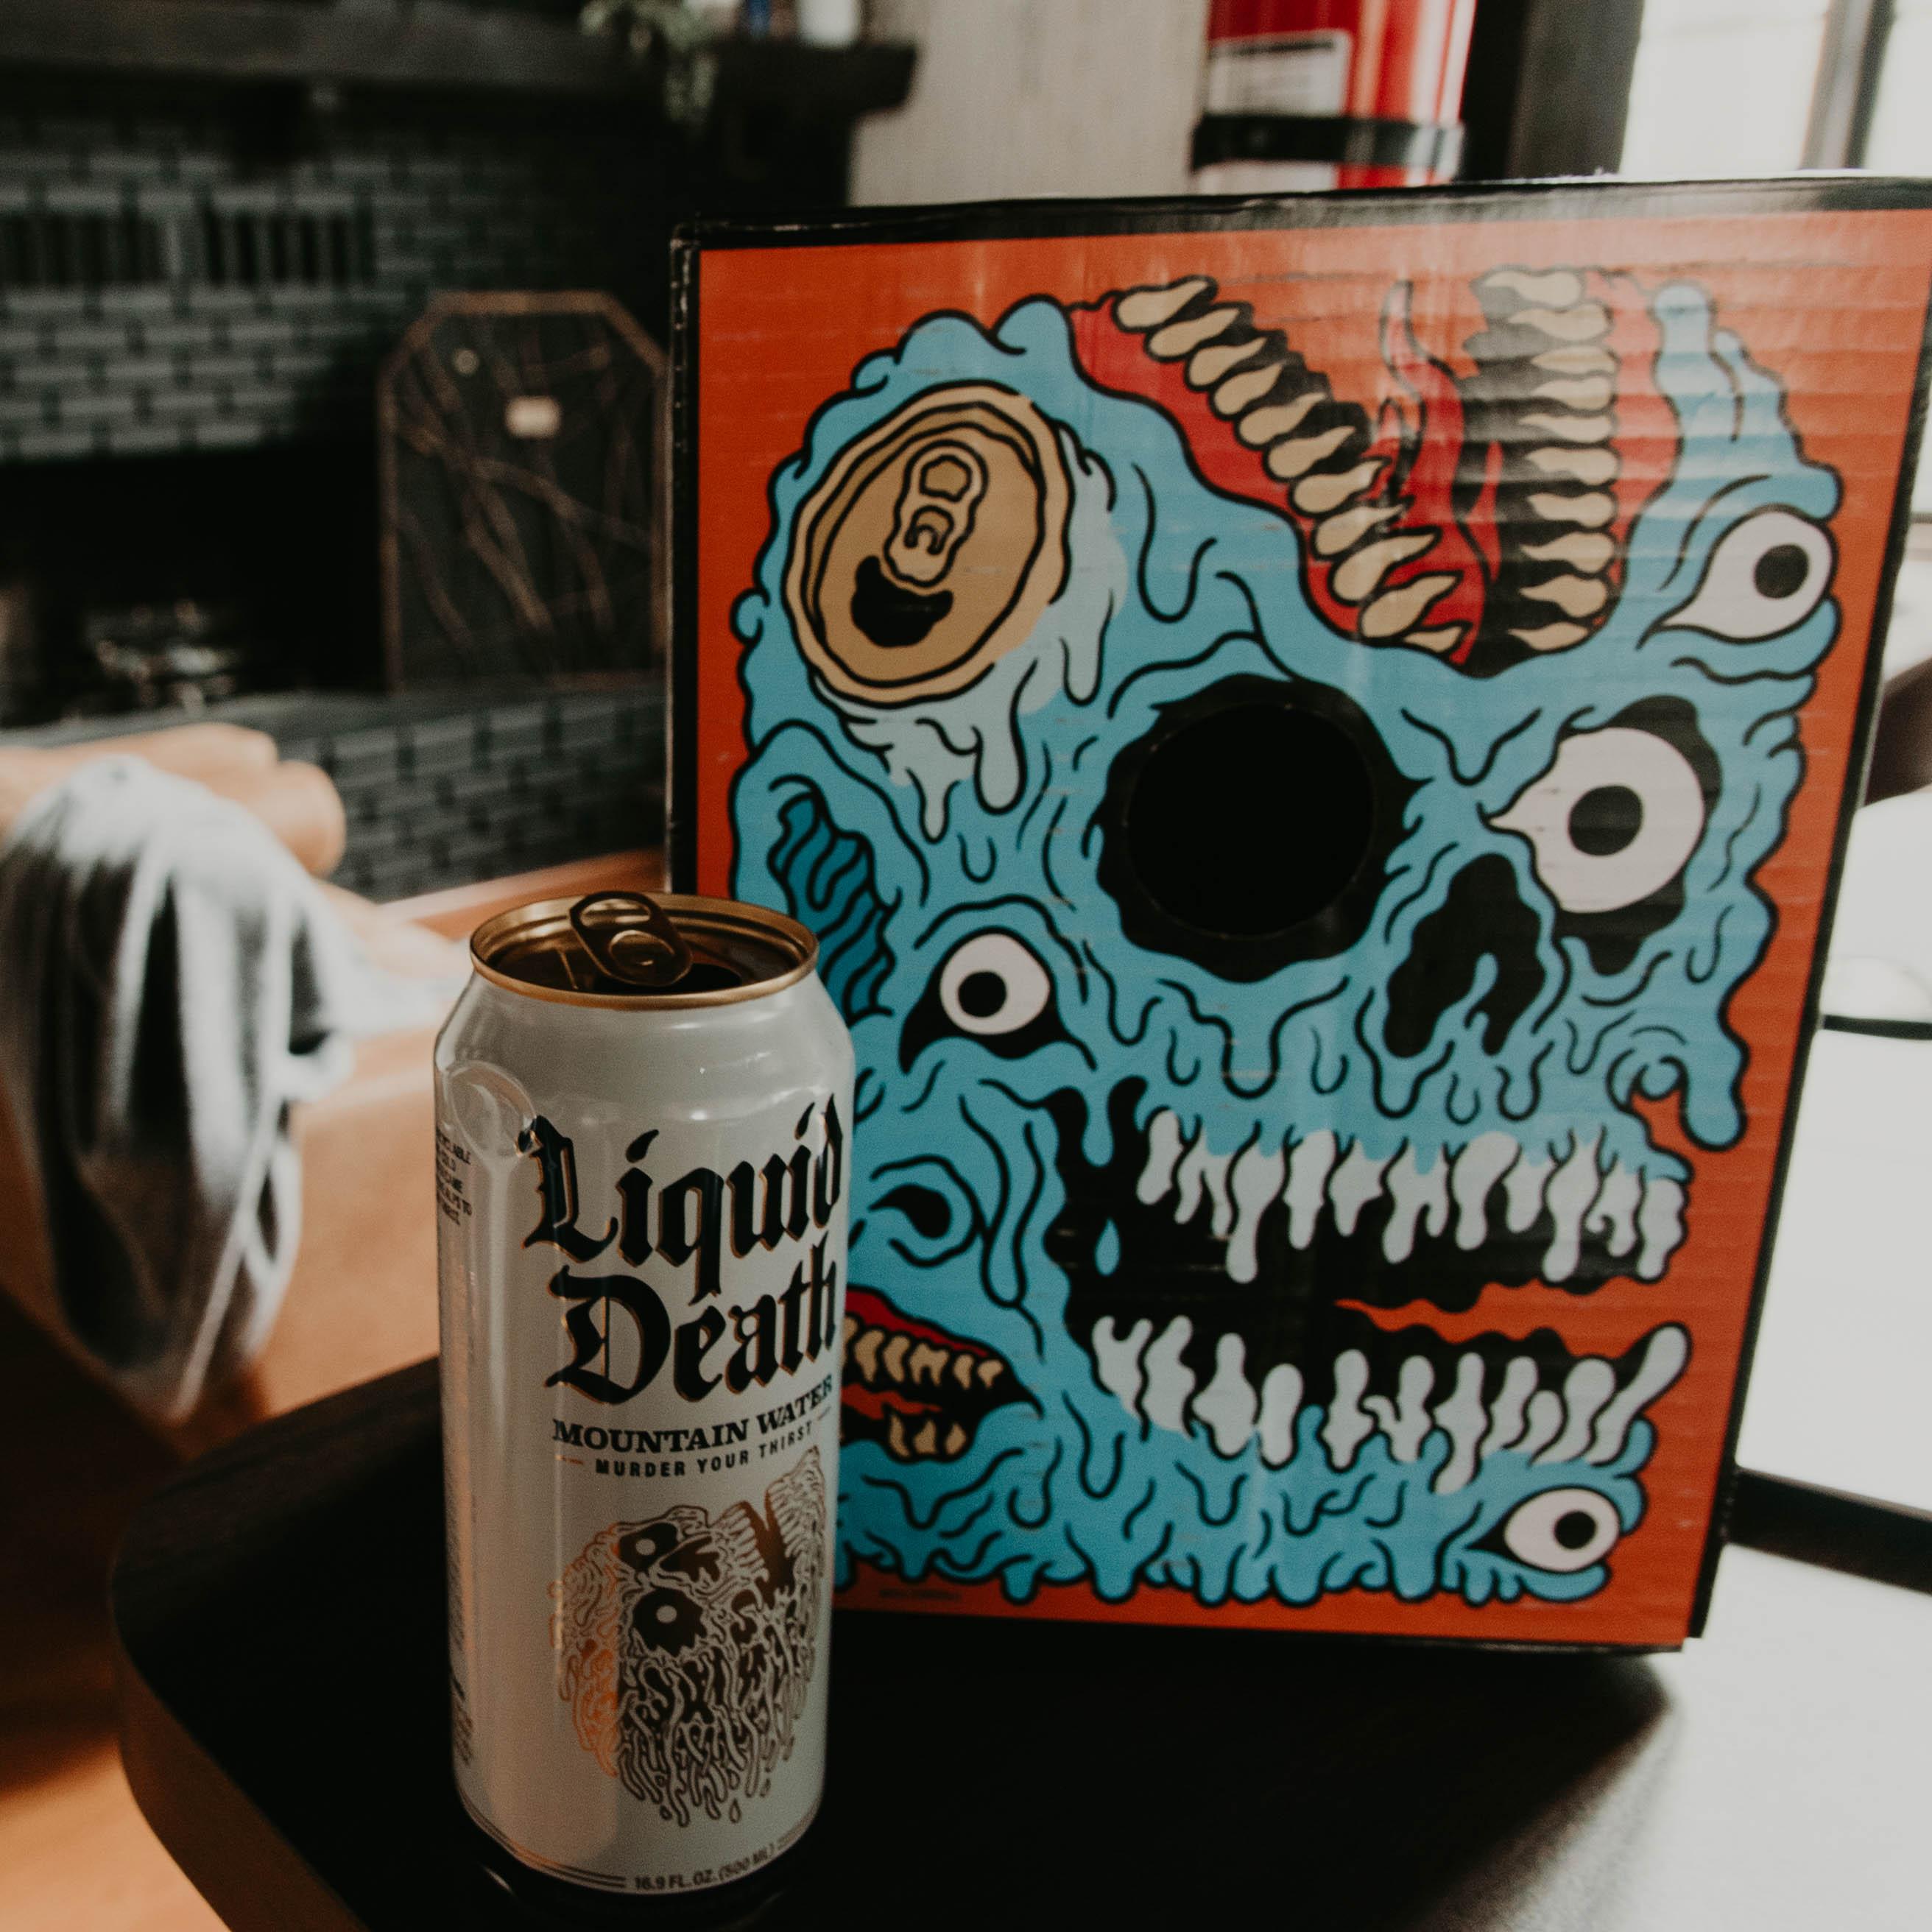 Liquid Death Products